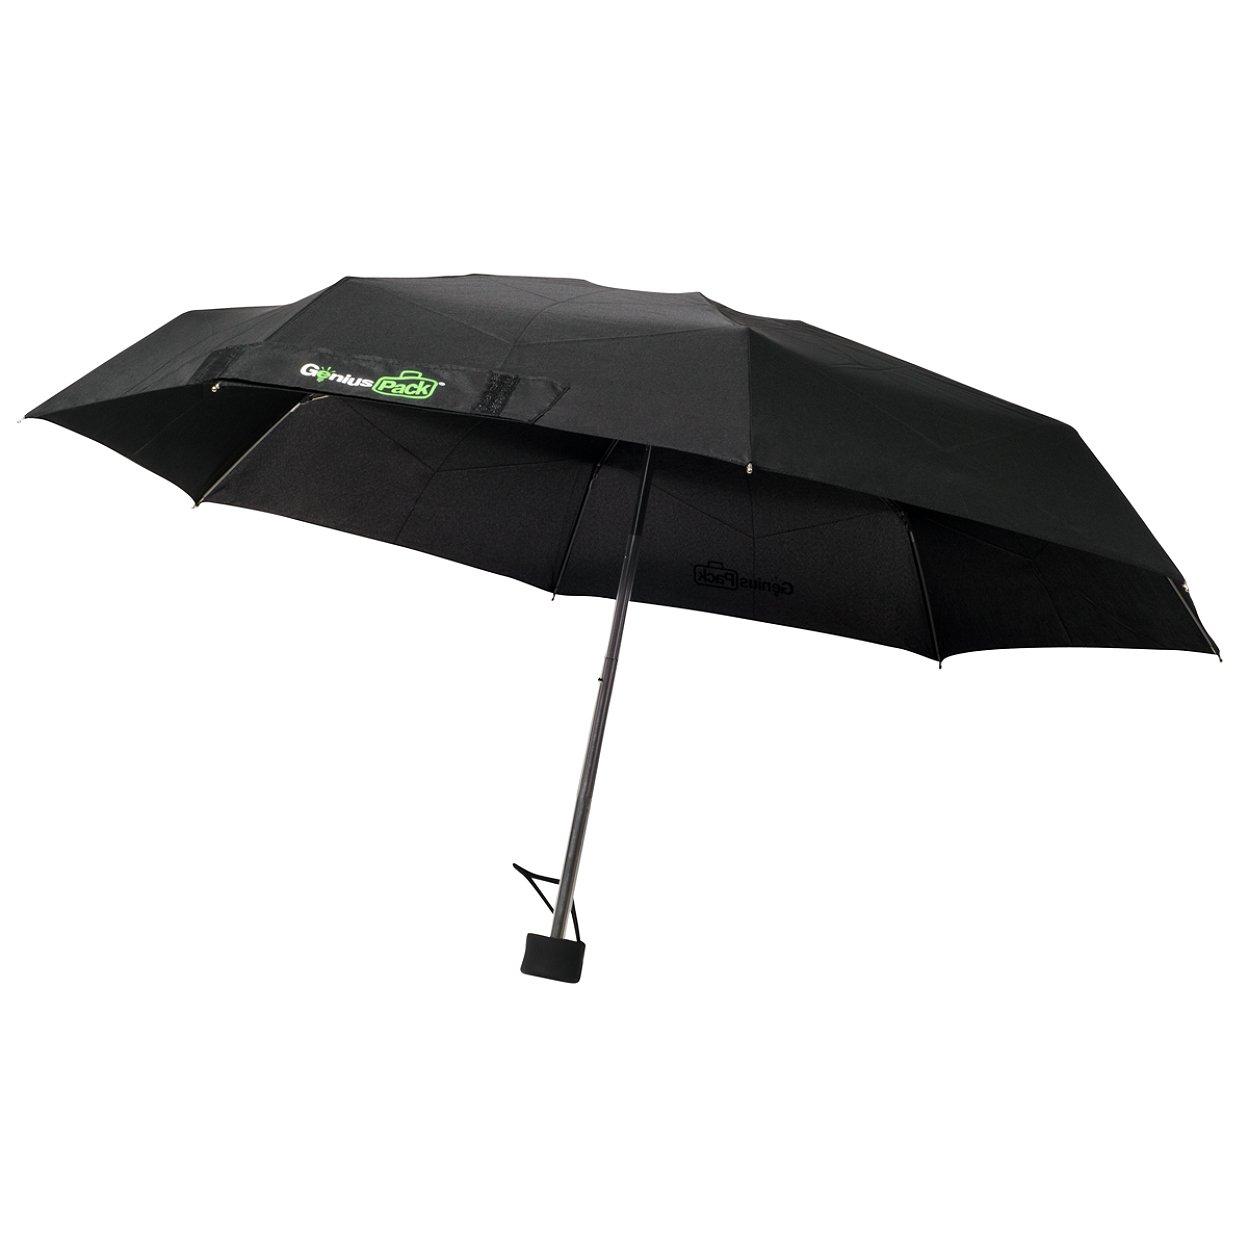 Genius Pack Micro Travel Umbrella v3.0 Improved Frame, No-Hassle Locking Mechanism